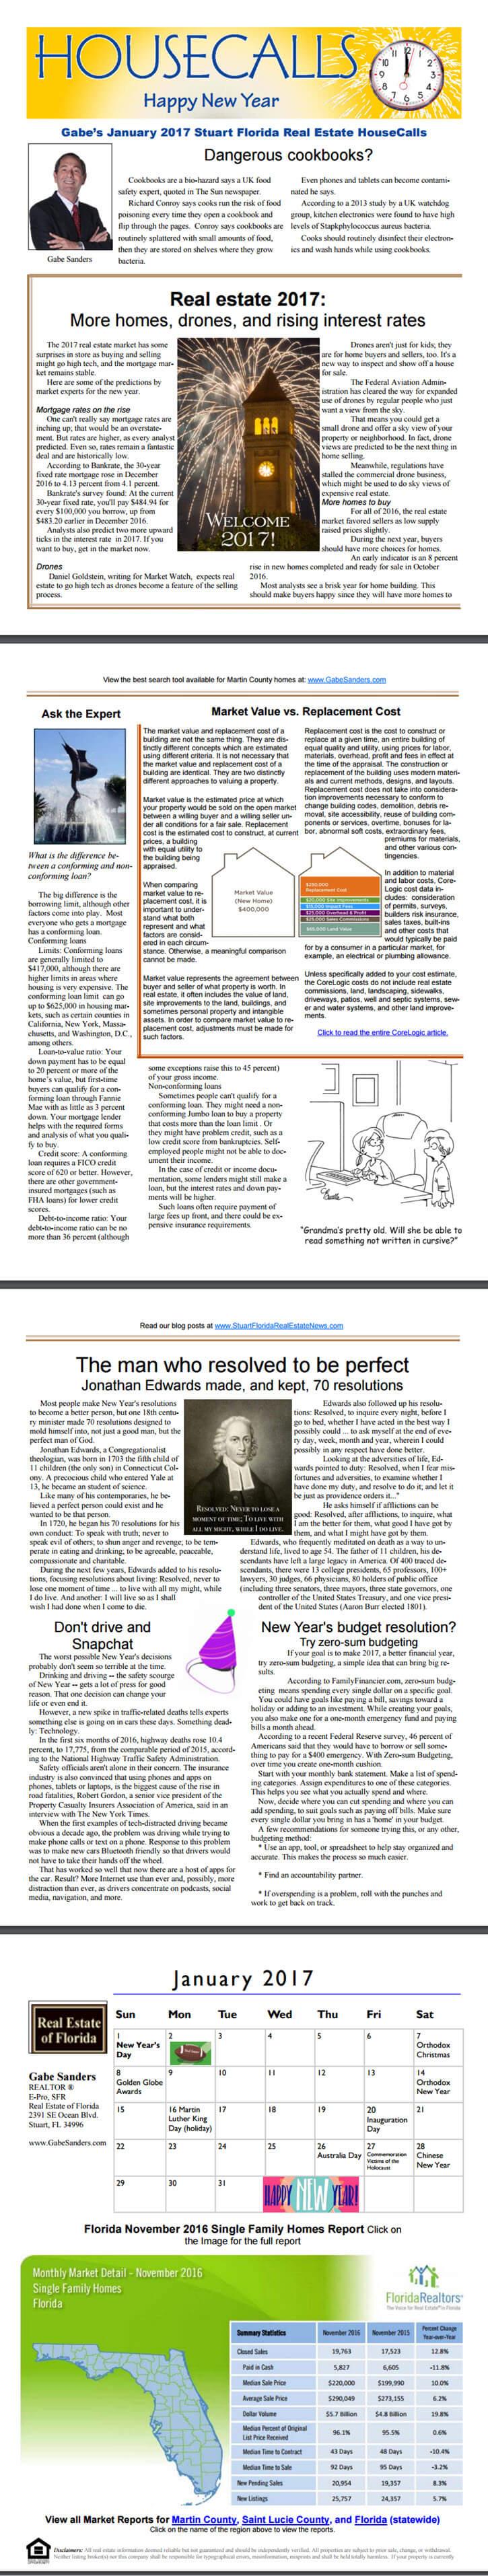 Gabes January 2017 HouseCalls Newsletter